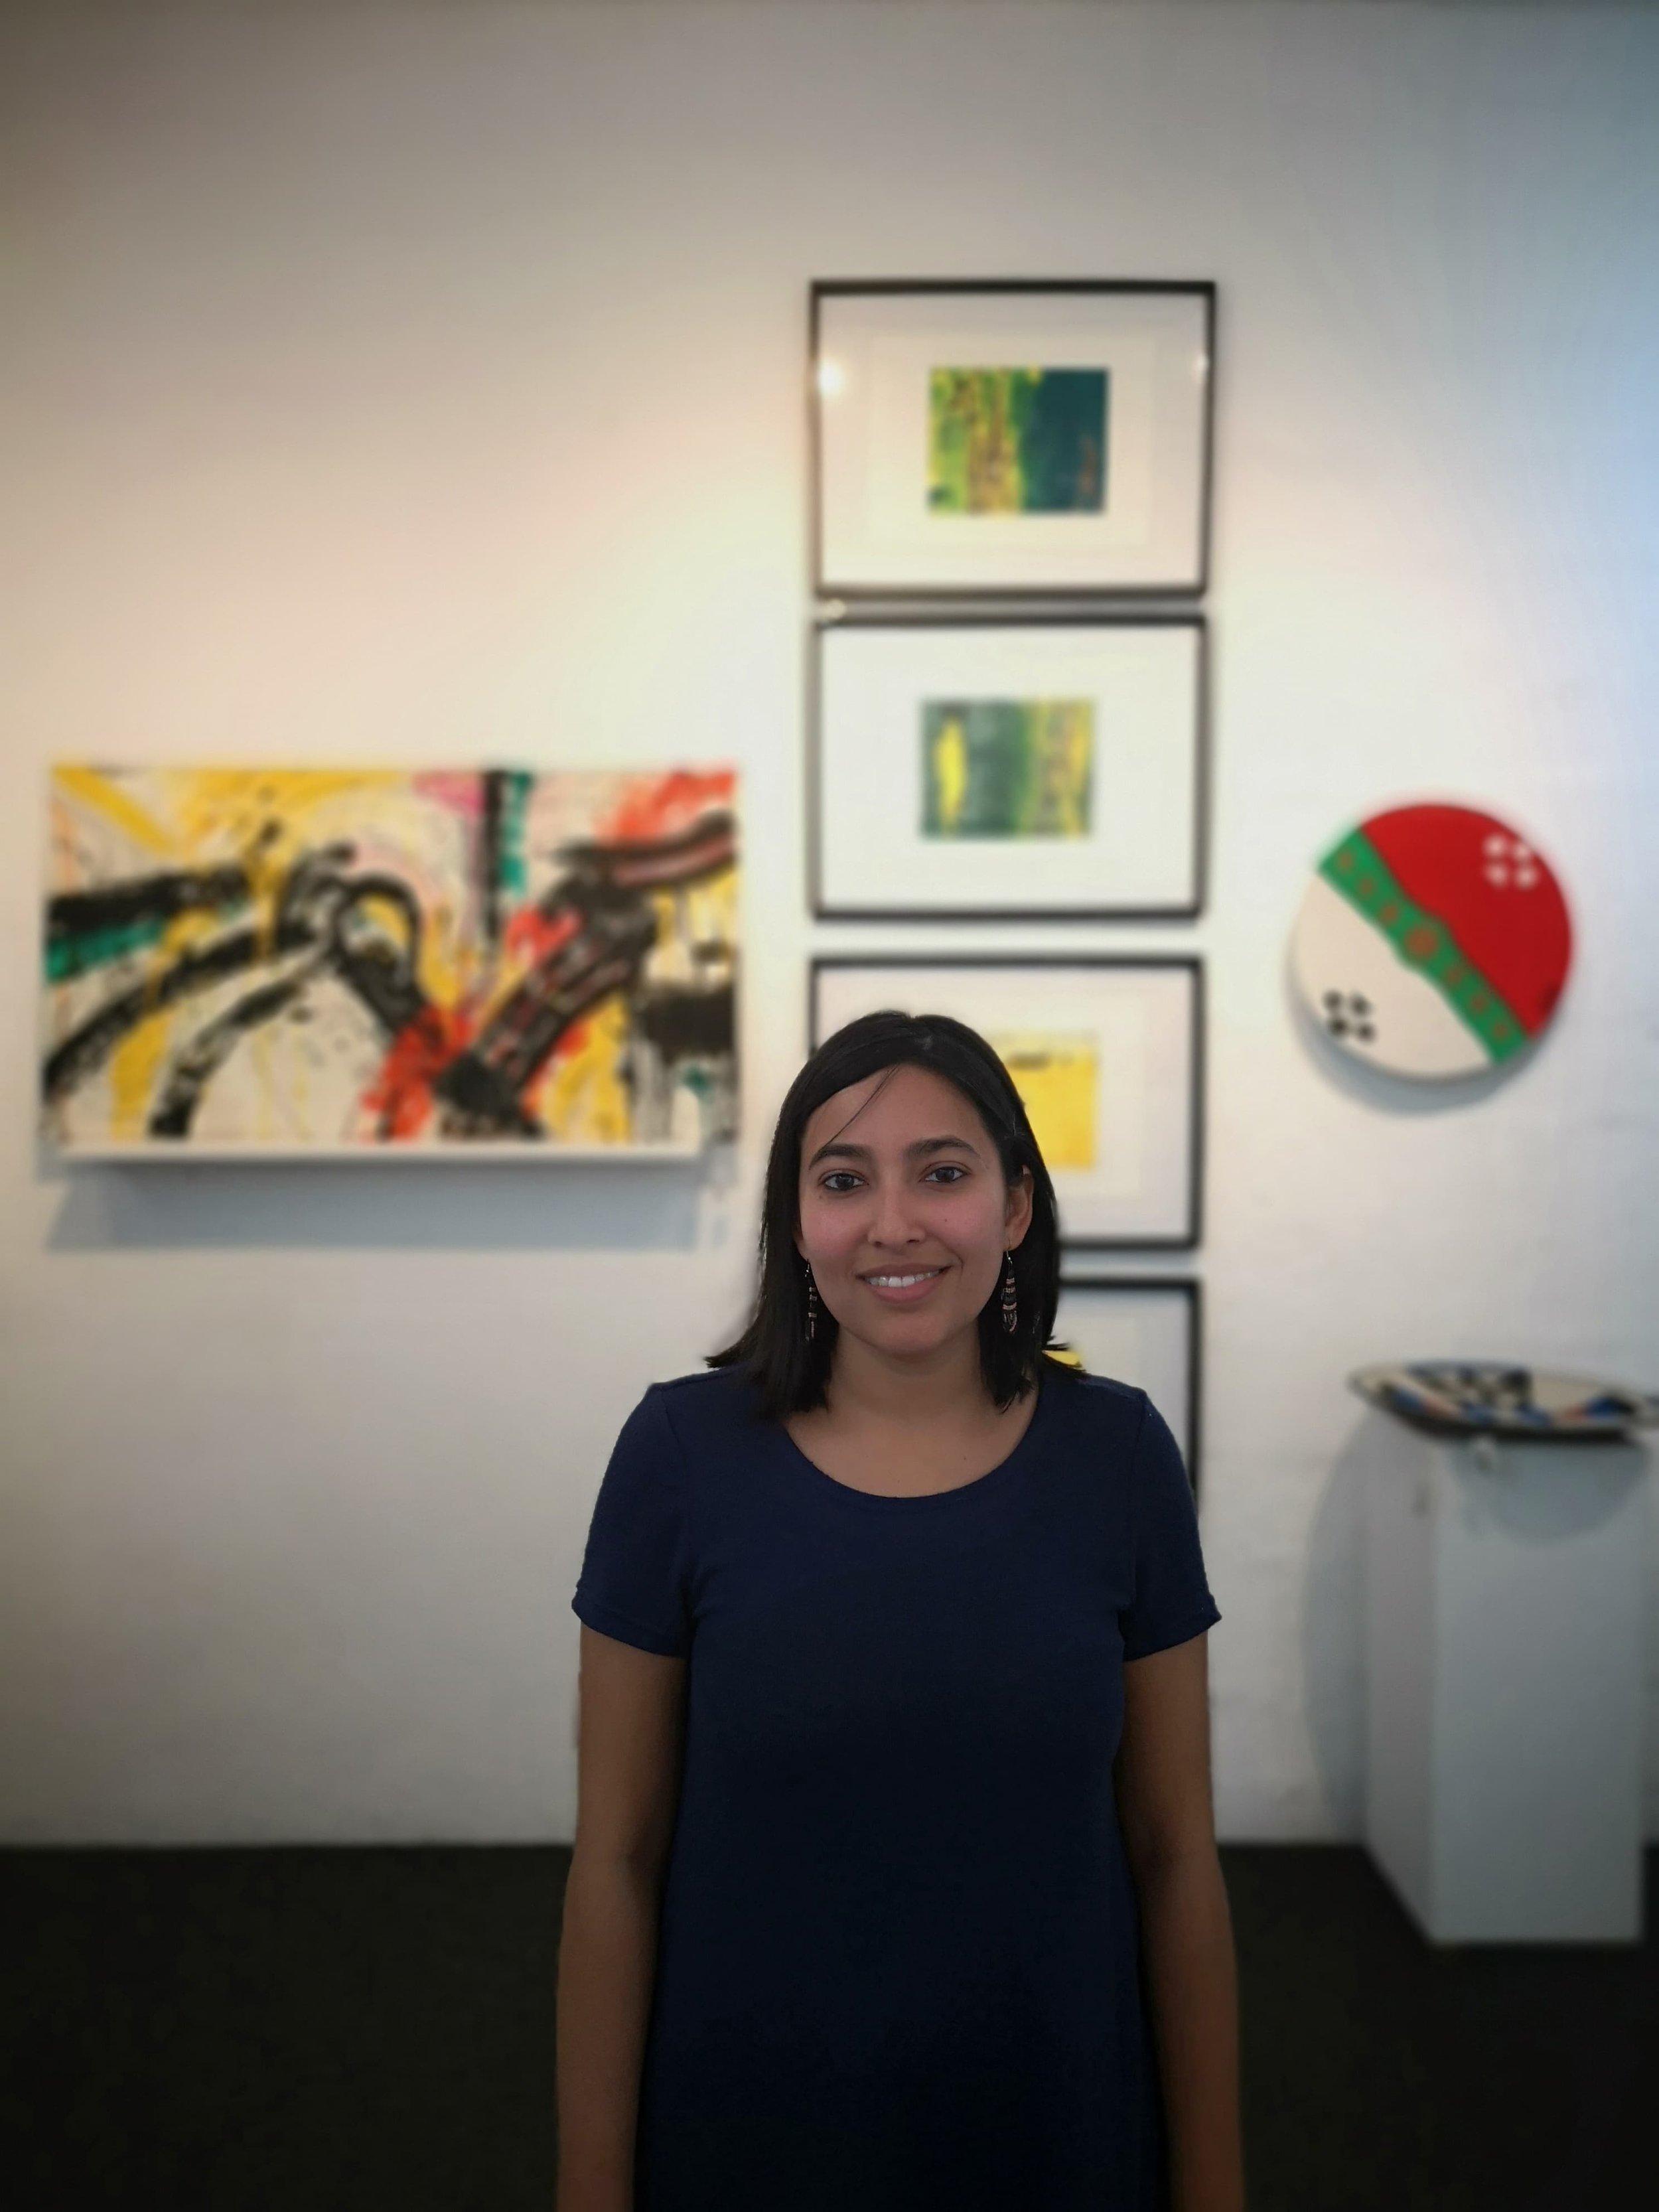 Sumayya Menezes   Specialist at KZNSA Gallery